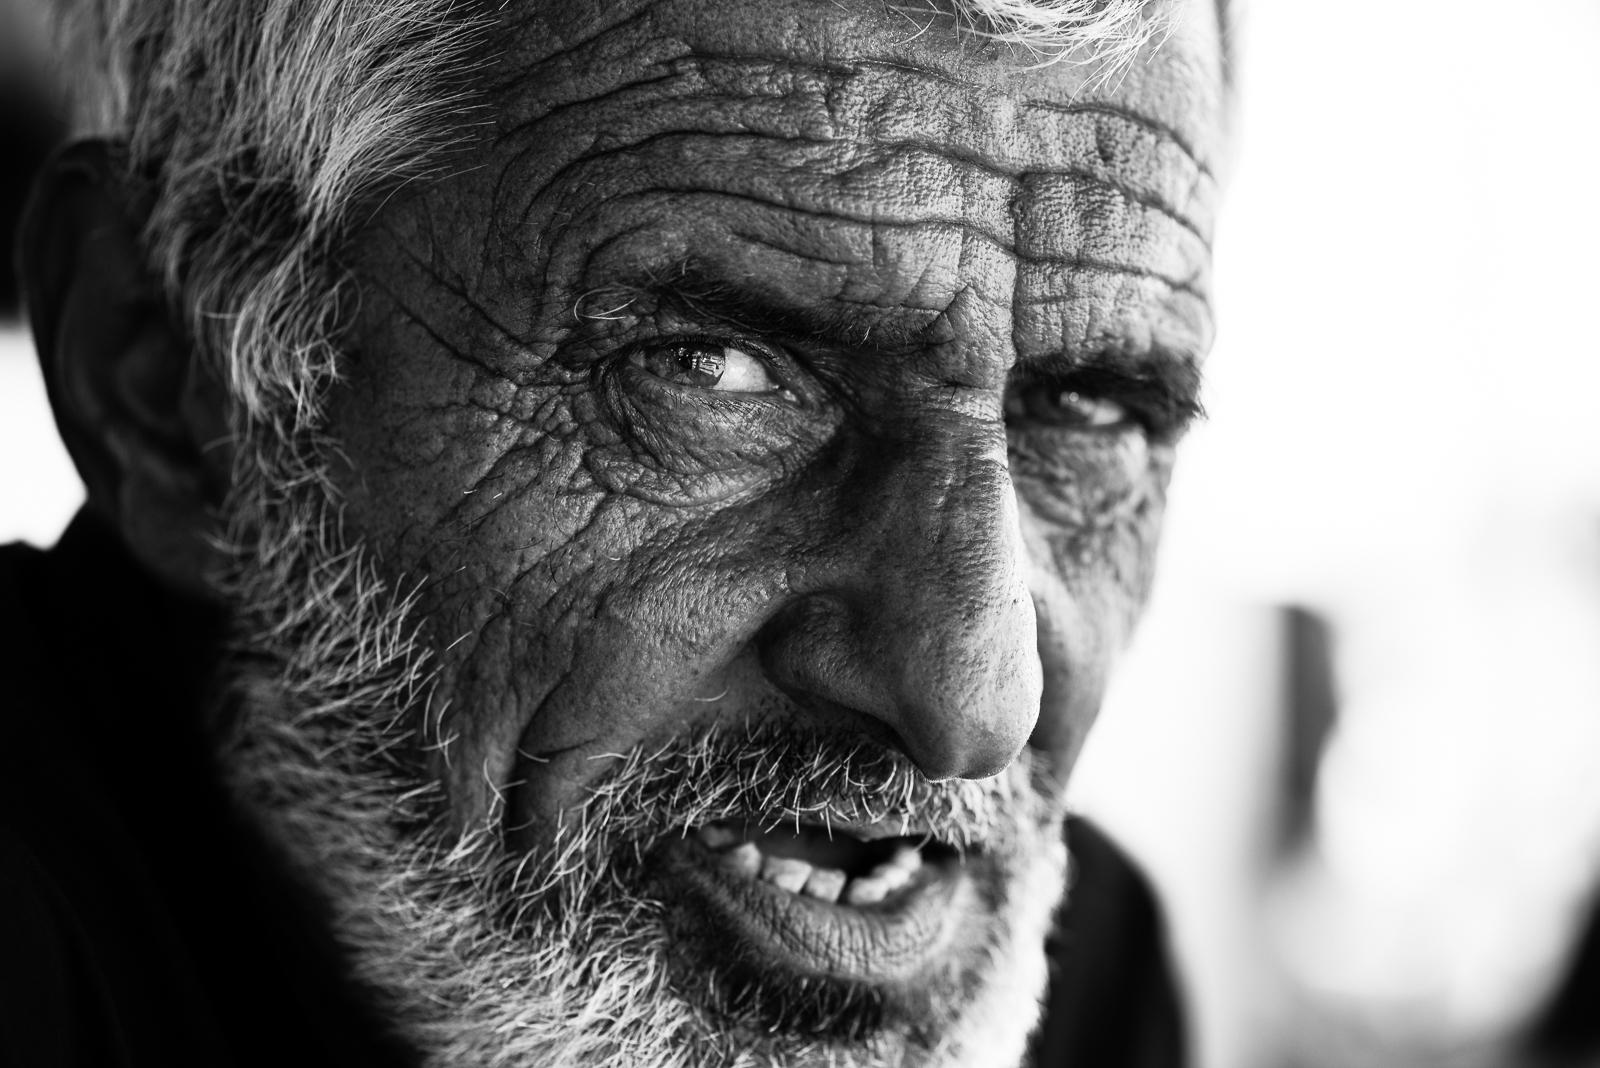 An old kurdish man in Diyarbakir, Turkey